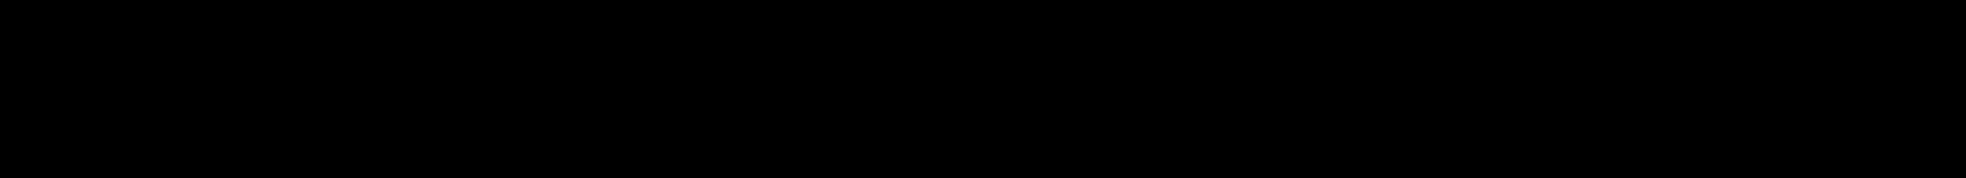 (E)-1-(2-(2-(2-Azidoethoxy)ethoxy)ethoxy)-4-bromobut-2-ene